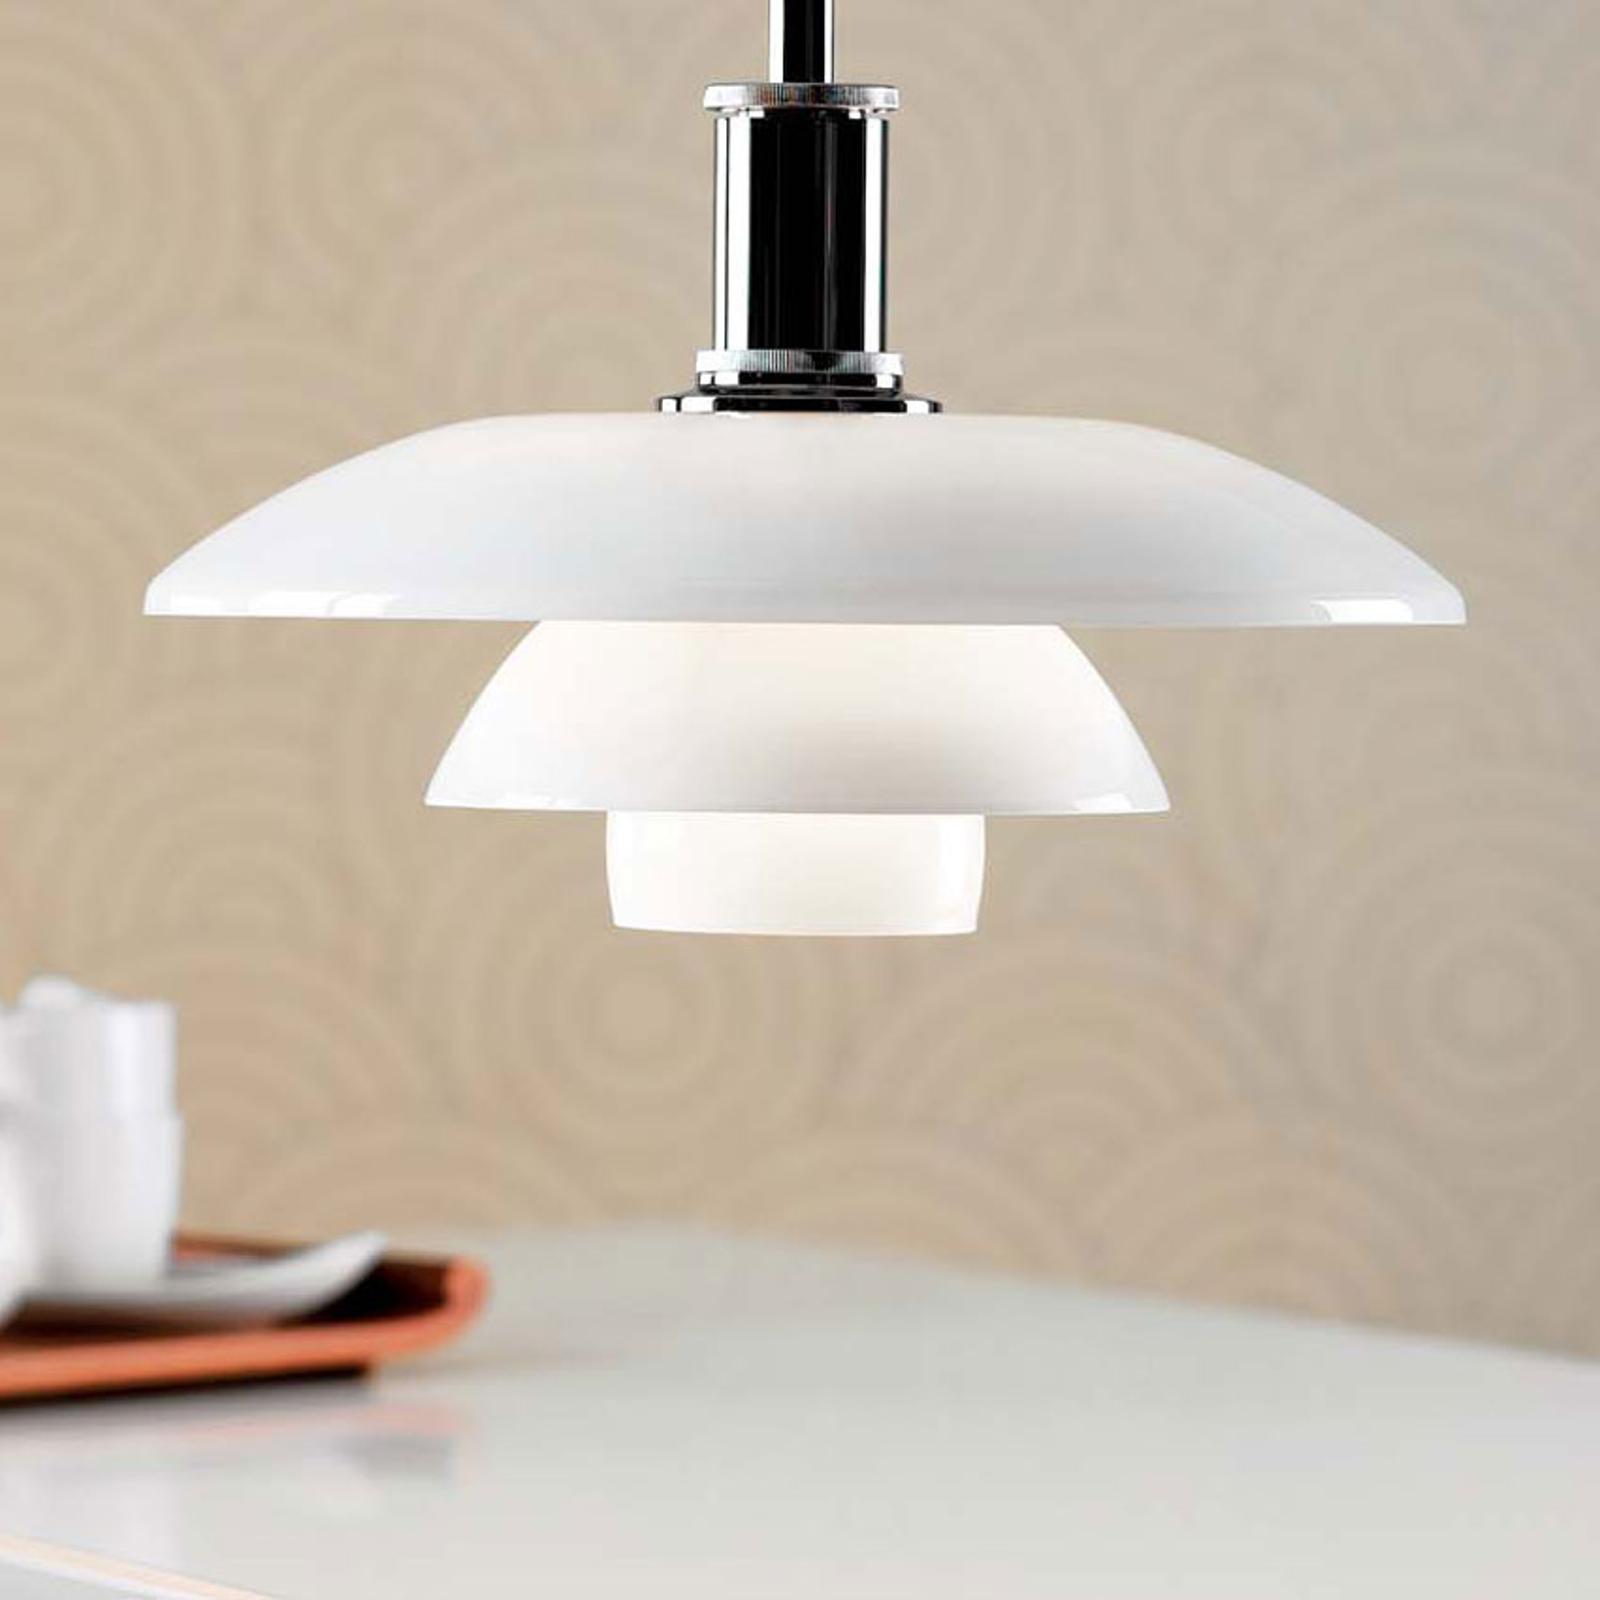 Louis Poulsen PH 3 1/2-3 glazen hanglamp zwart